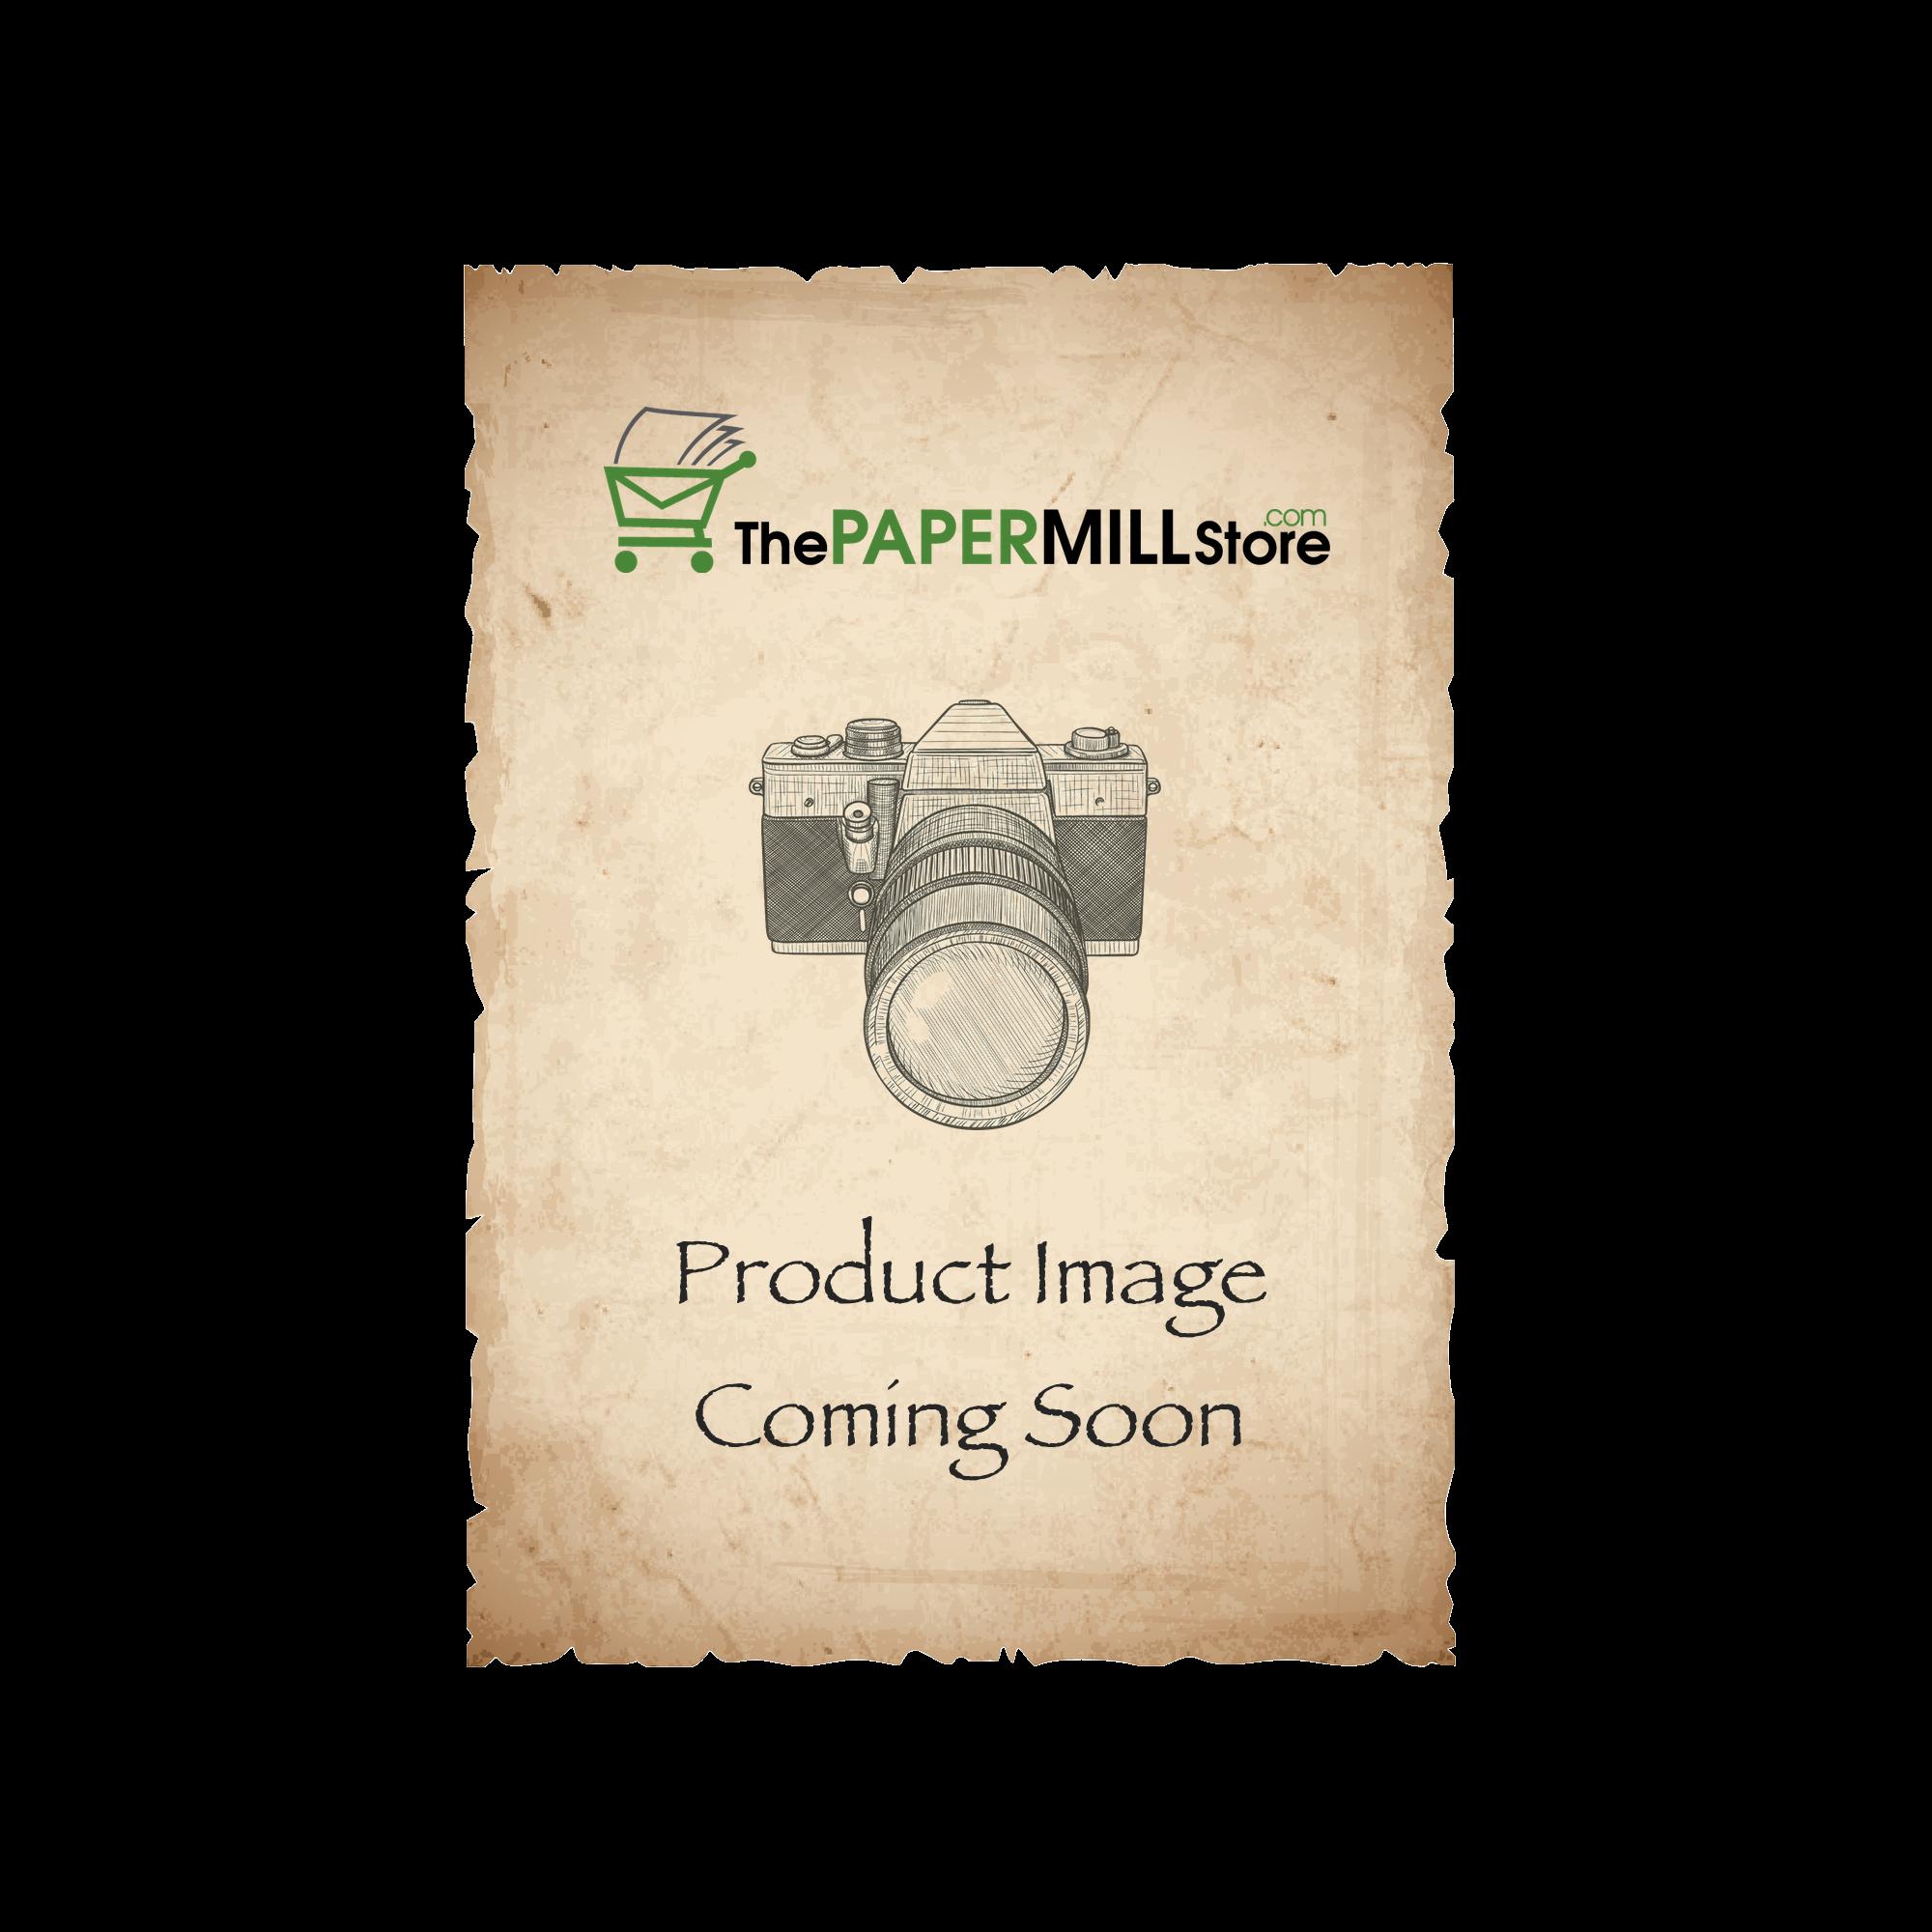 Astrobrights Gemini Green Card Stock - 23 x 35 in 65 lb Cover Smooth 500 per Carton